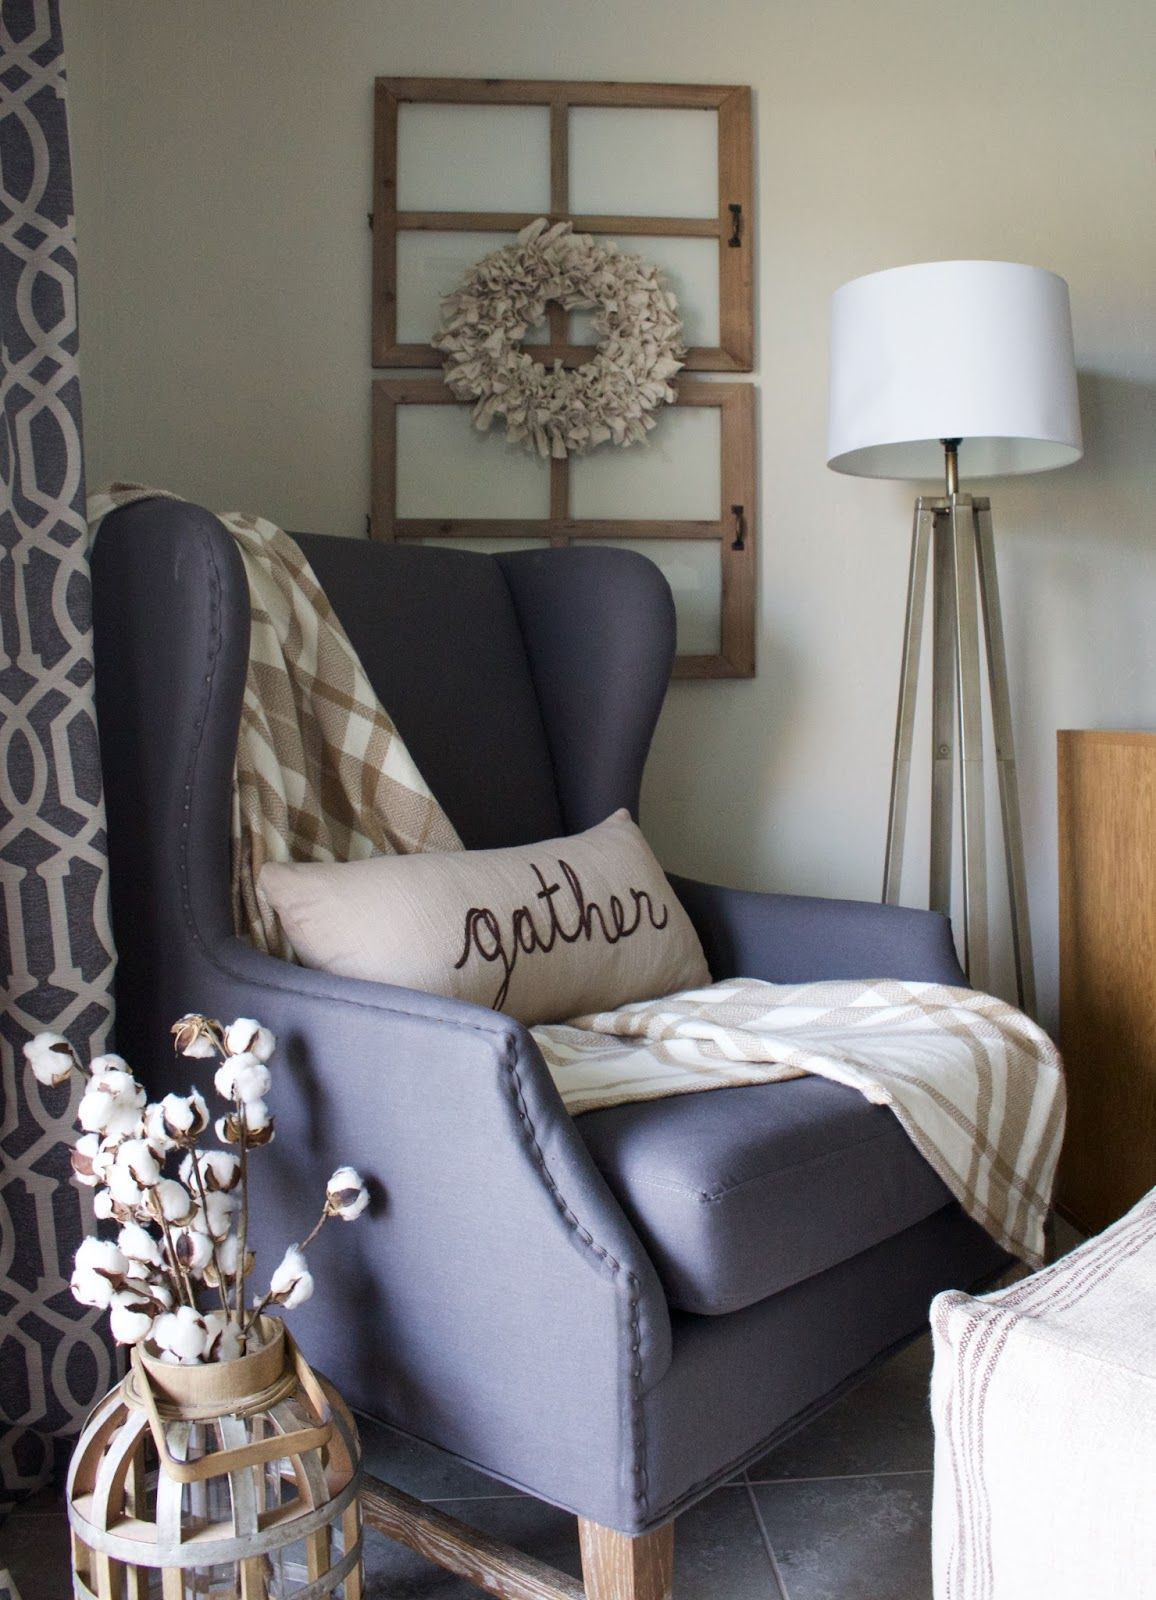 DIY Drop Cloth Wreath - perfect Fall wreath! | Living room ...